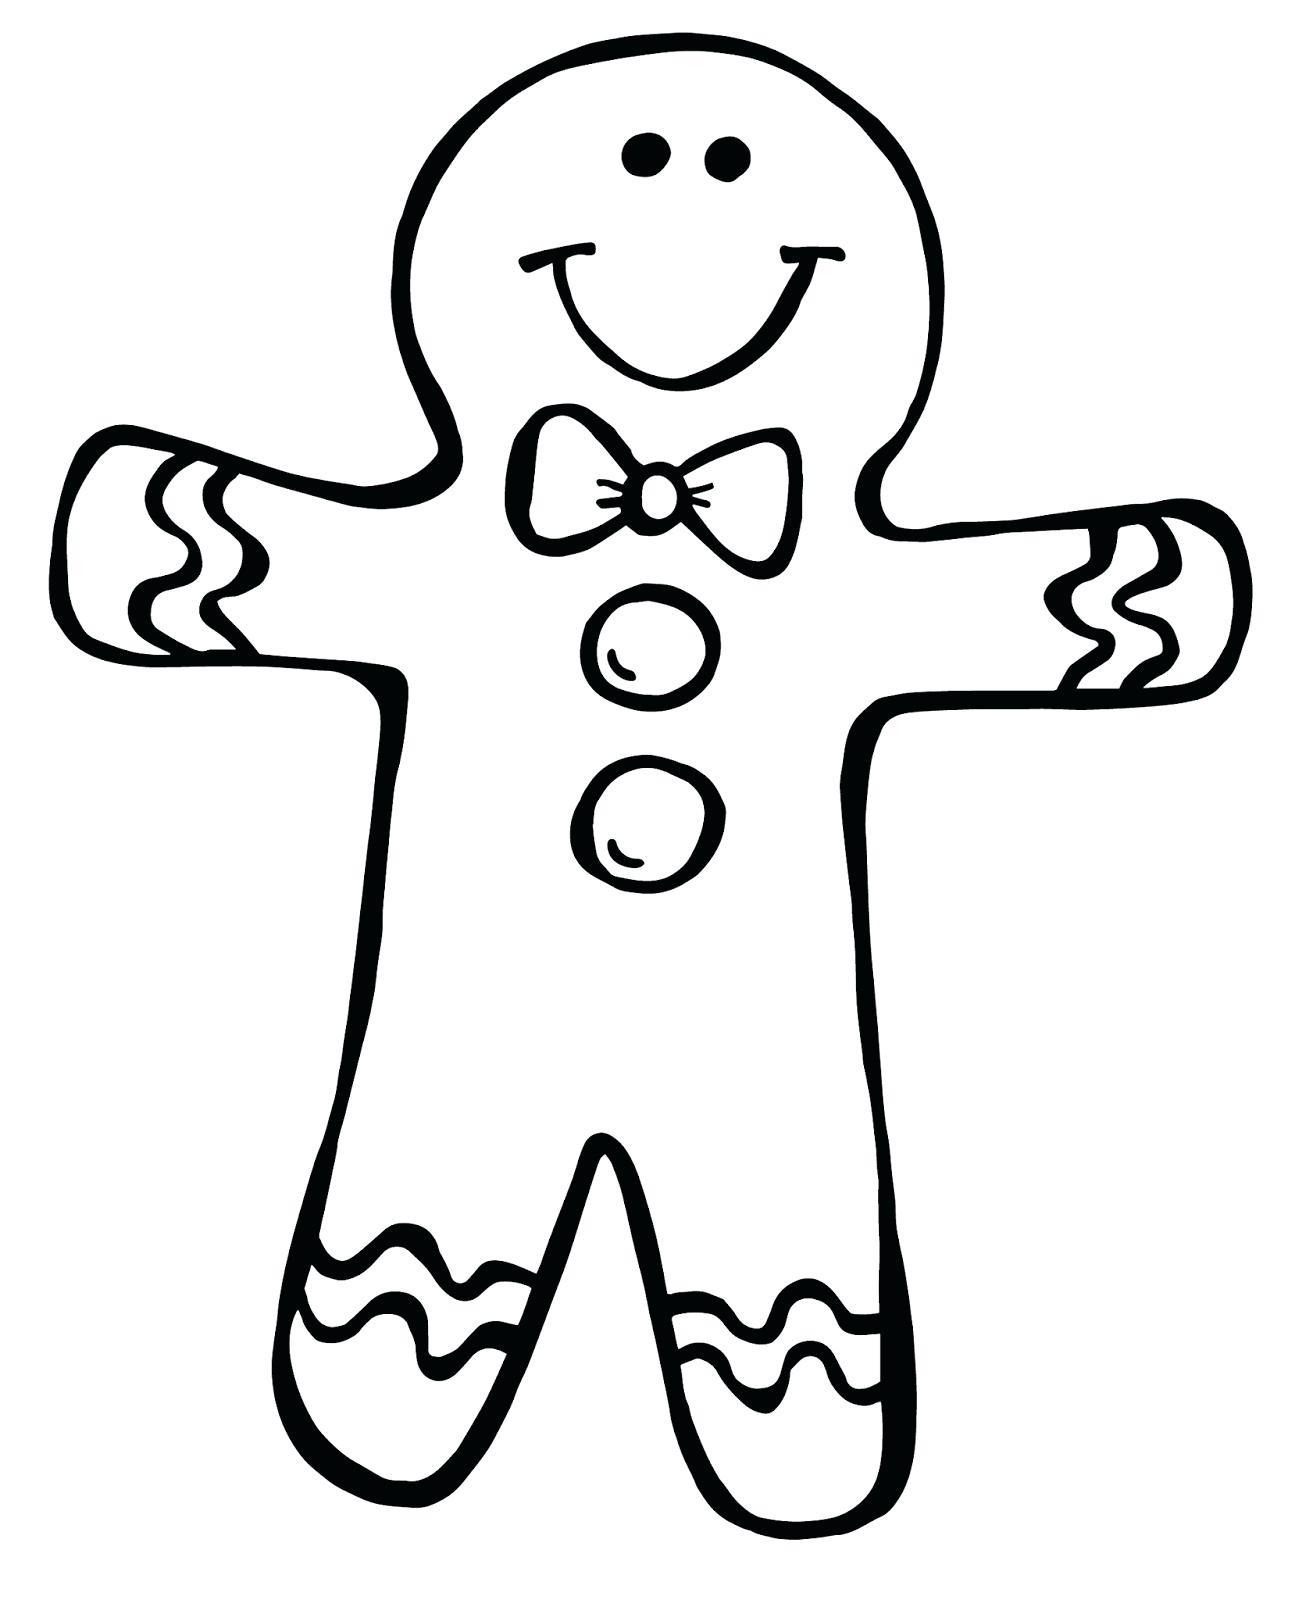 1313x1600 Gingerbread Man Outline Clipart Gingerbread Man Men Outlines Clip